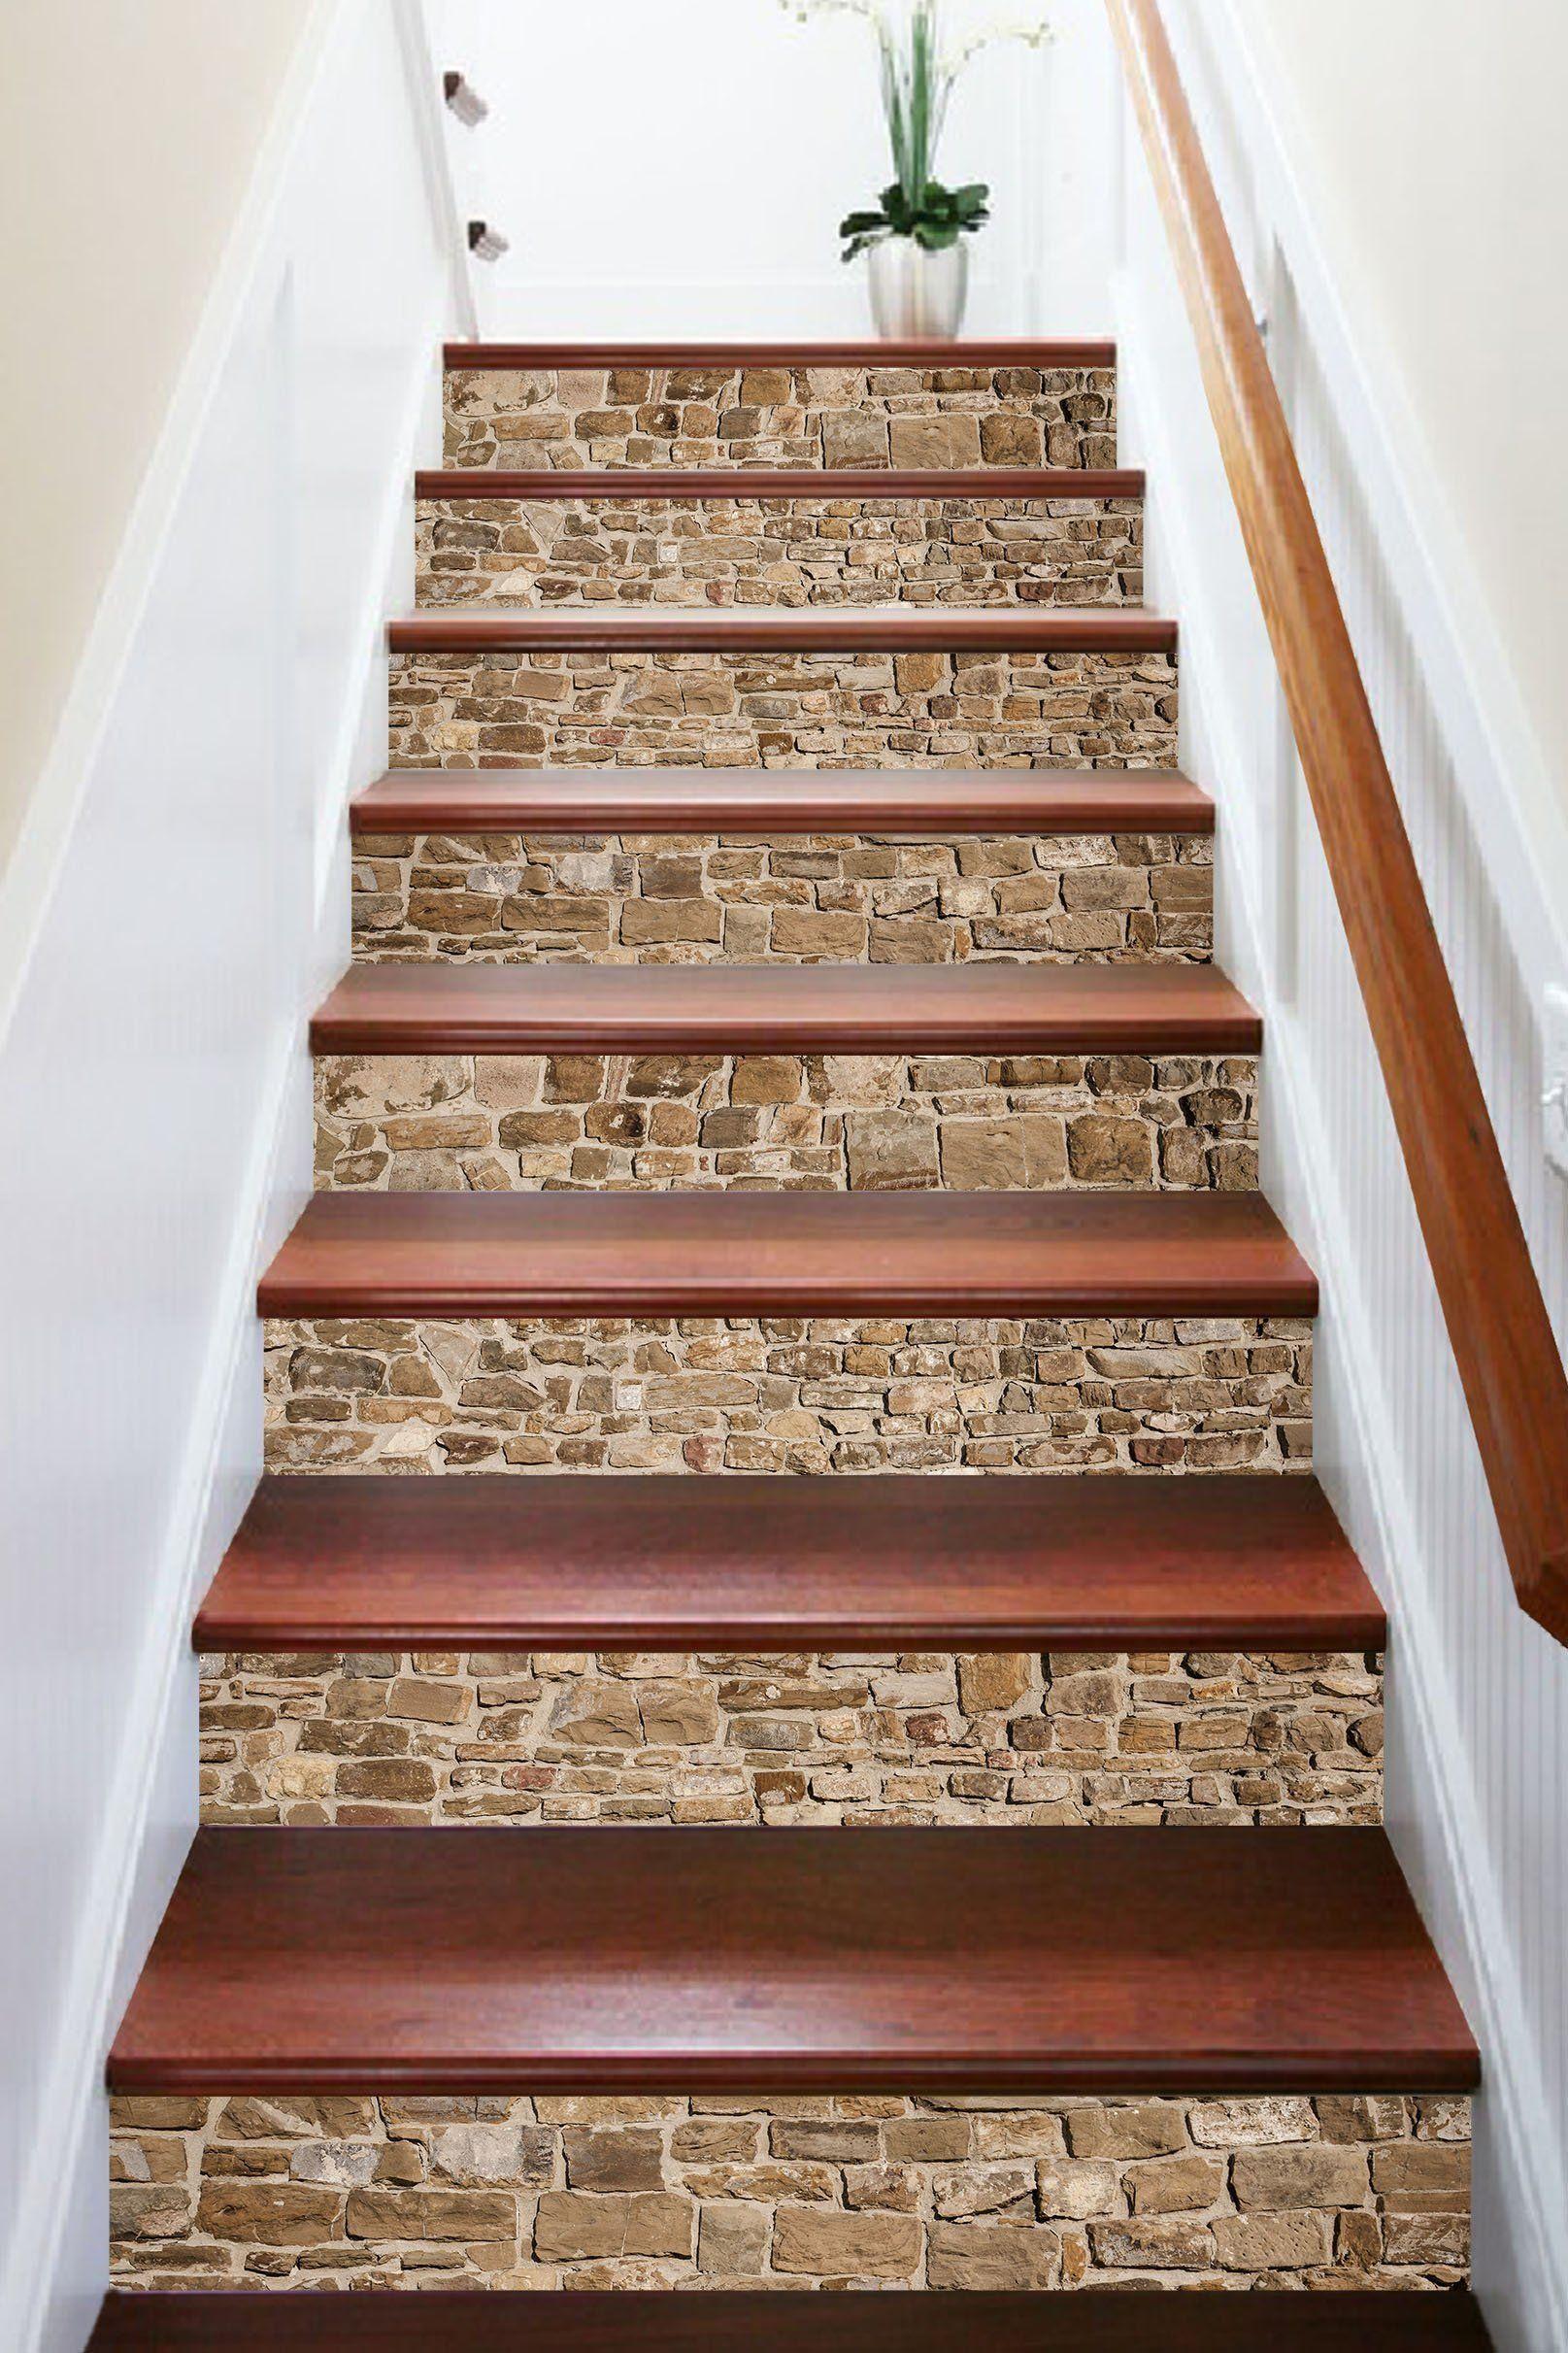 3D Vintage Brick 669 Marble Tile Texture Stair Risers